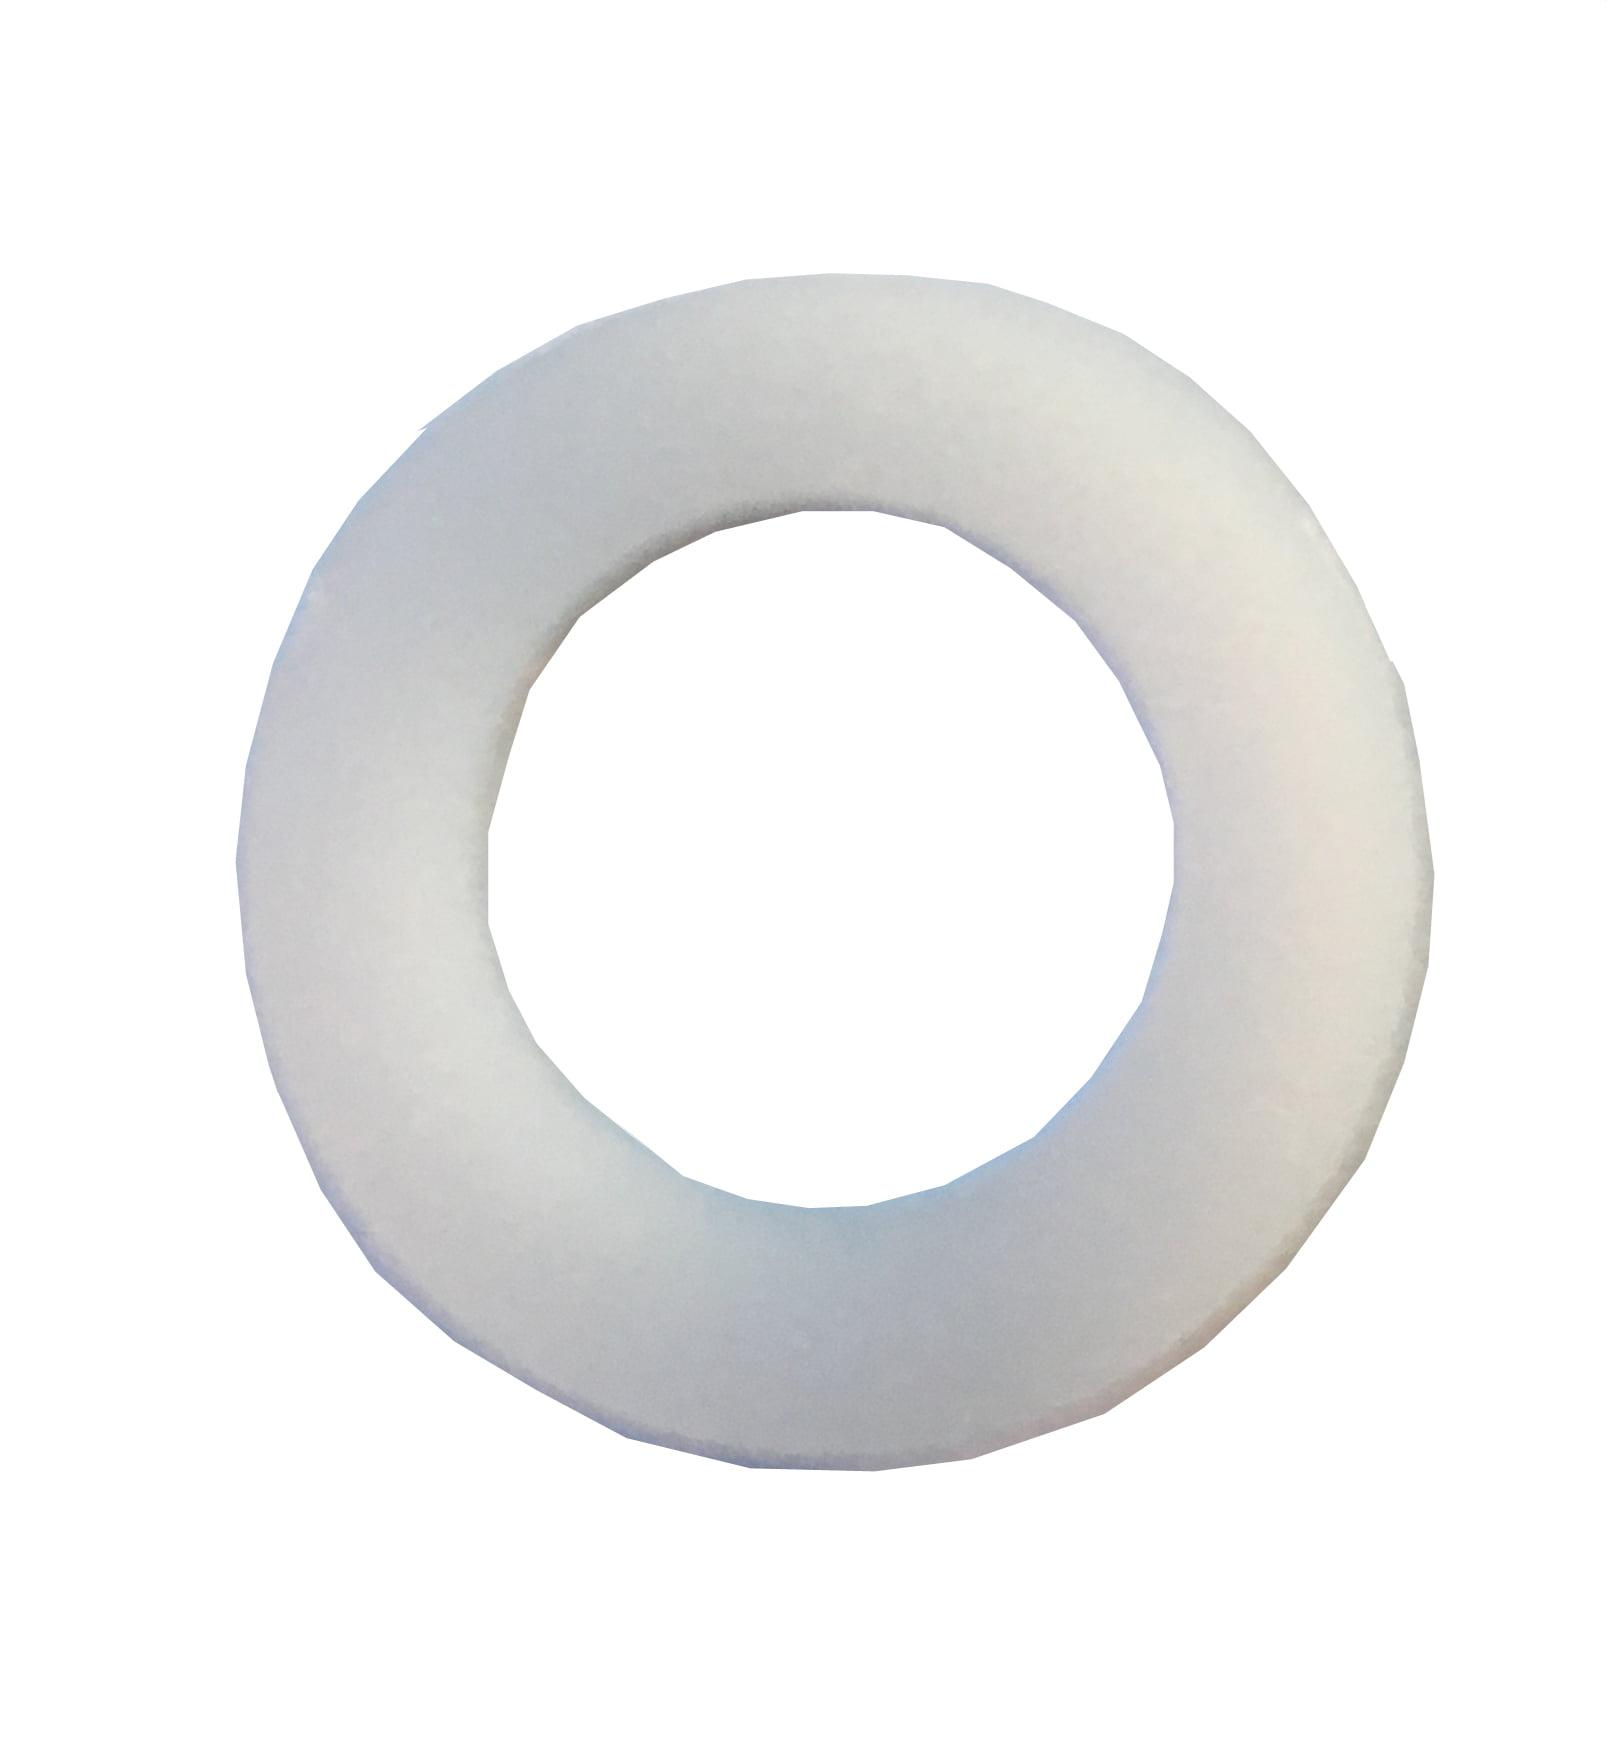 .062 Thick Clipsandfasteners Inc 50 1//4 Nylon Flat Washers .317 I.D